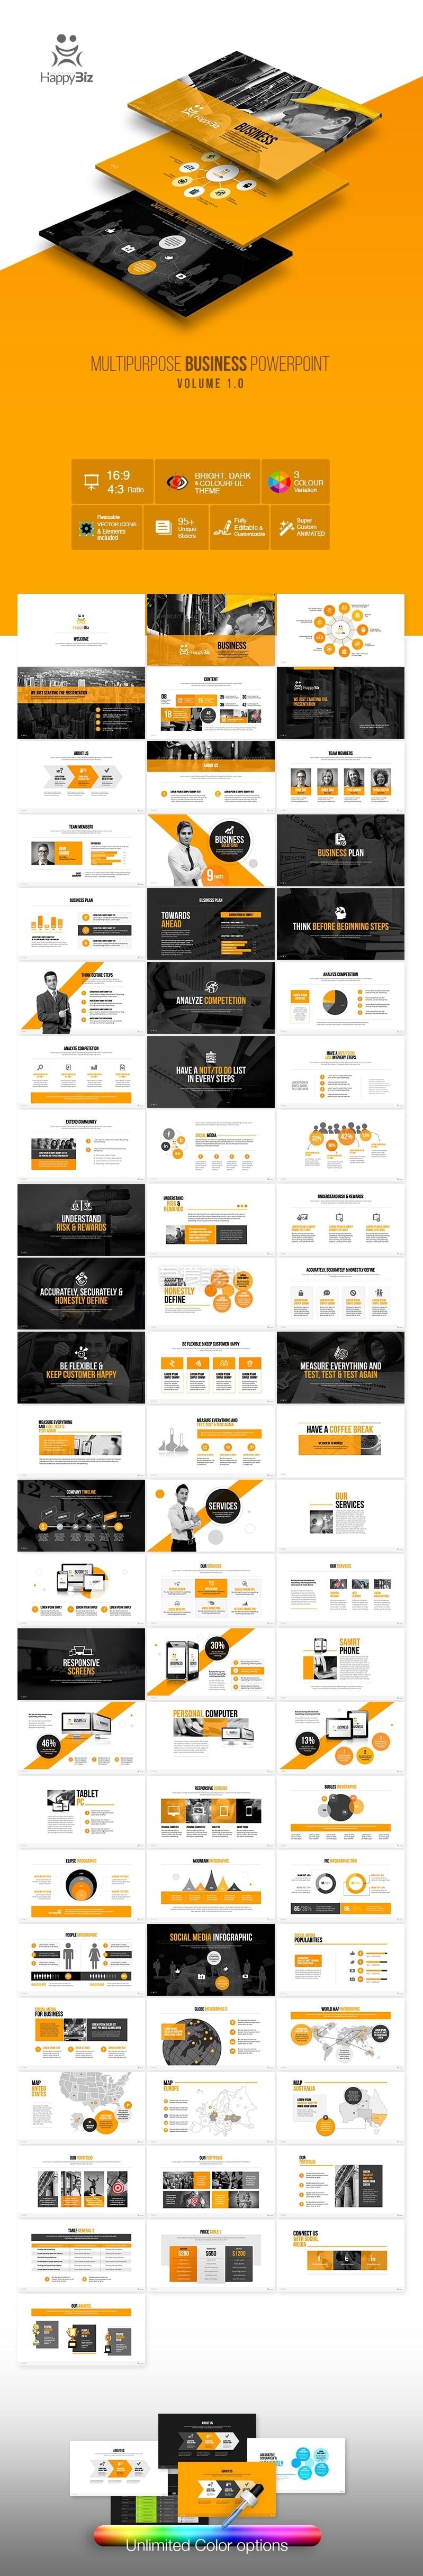 happybiz-business-powerpoint-1607-preview_01